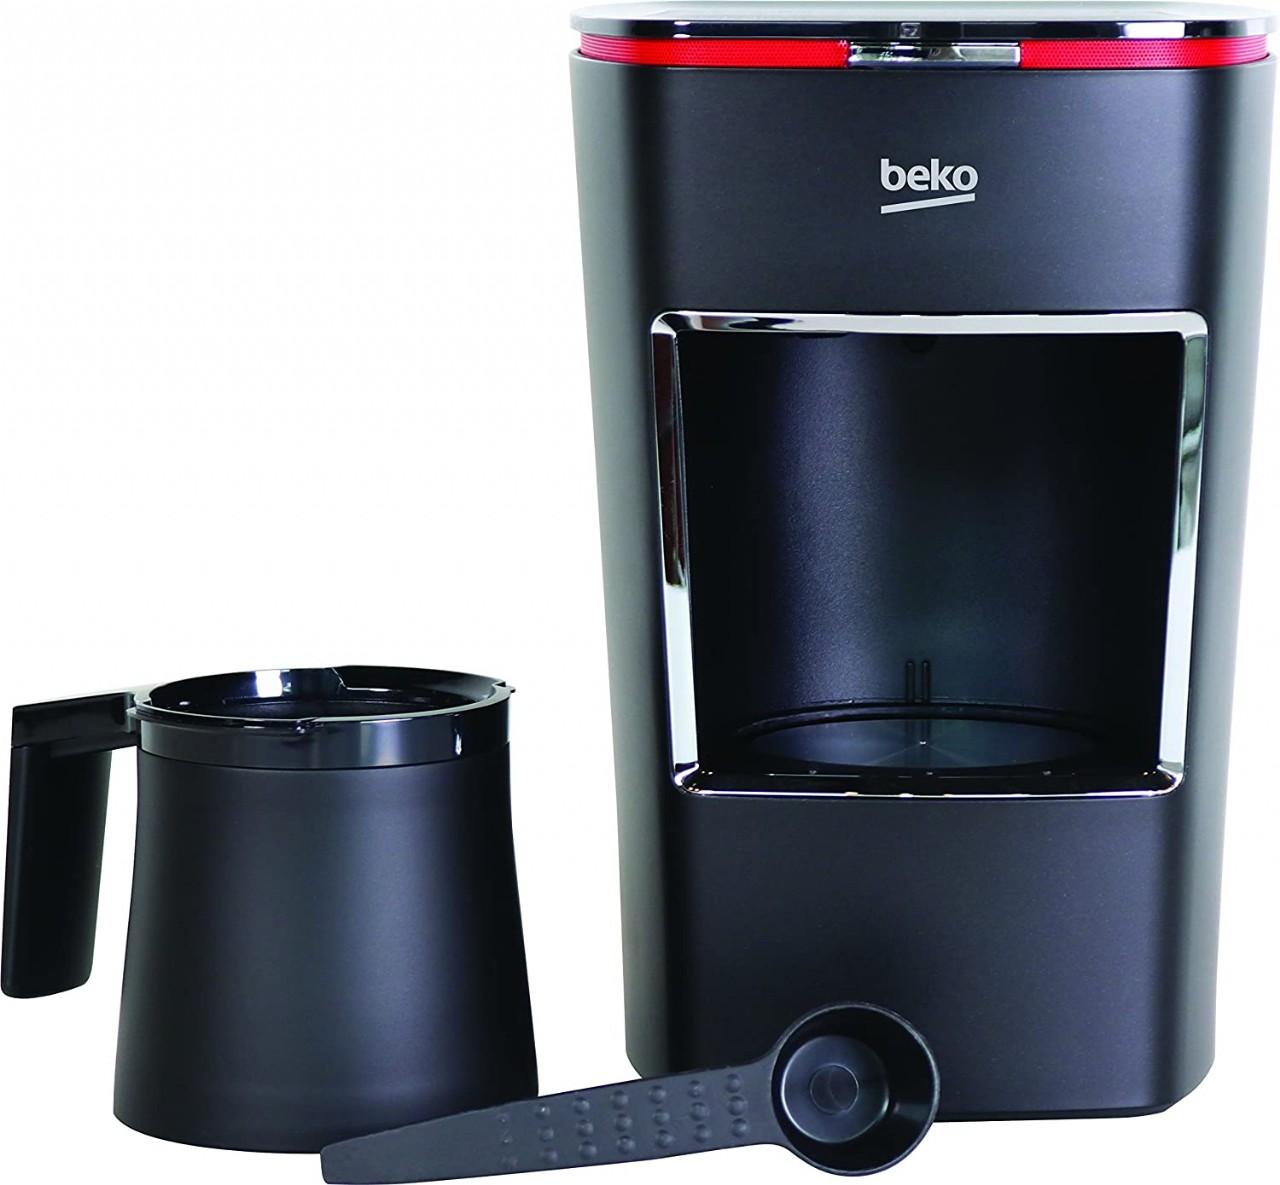 Beko 2-Cup Turkish Coffee Maker (Black)